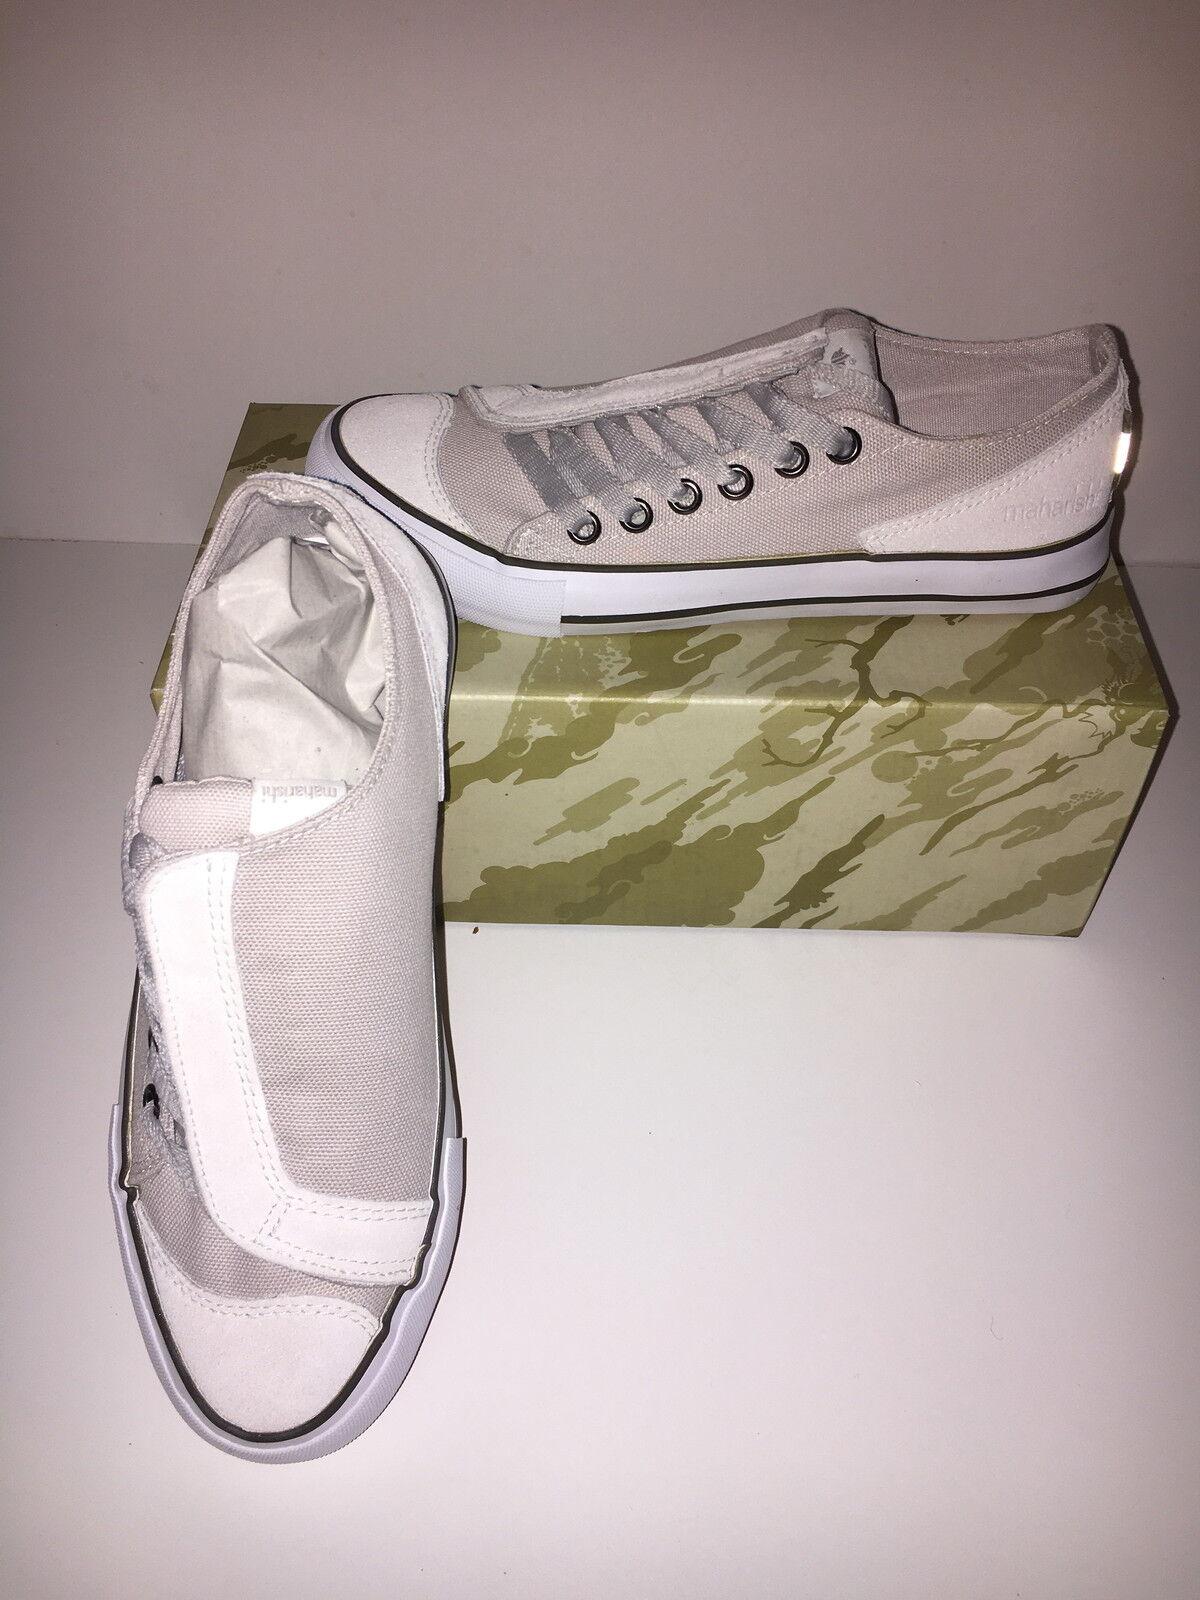 MAHARISHI Damenschuhe ASYM CANVAS SUEDE AND CANVAS ASYM DAY Schuhe IN STONE 01b450